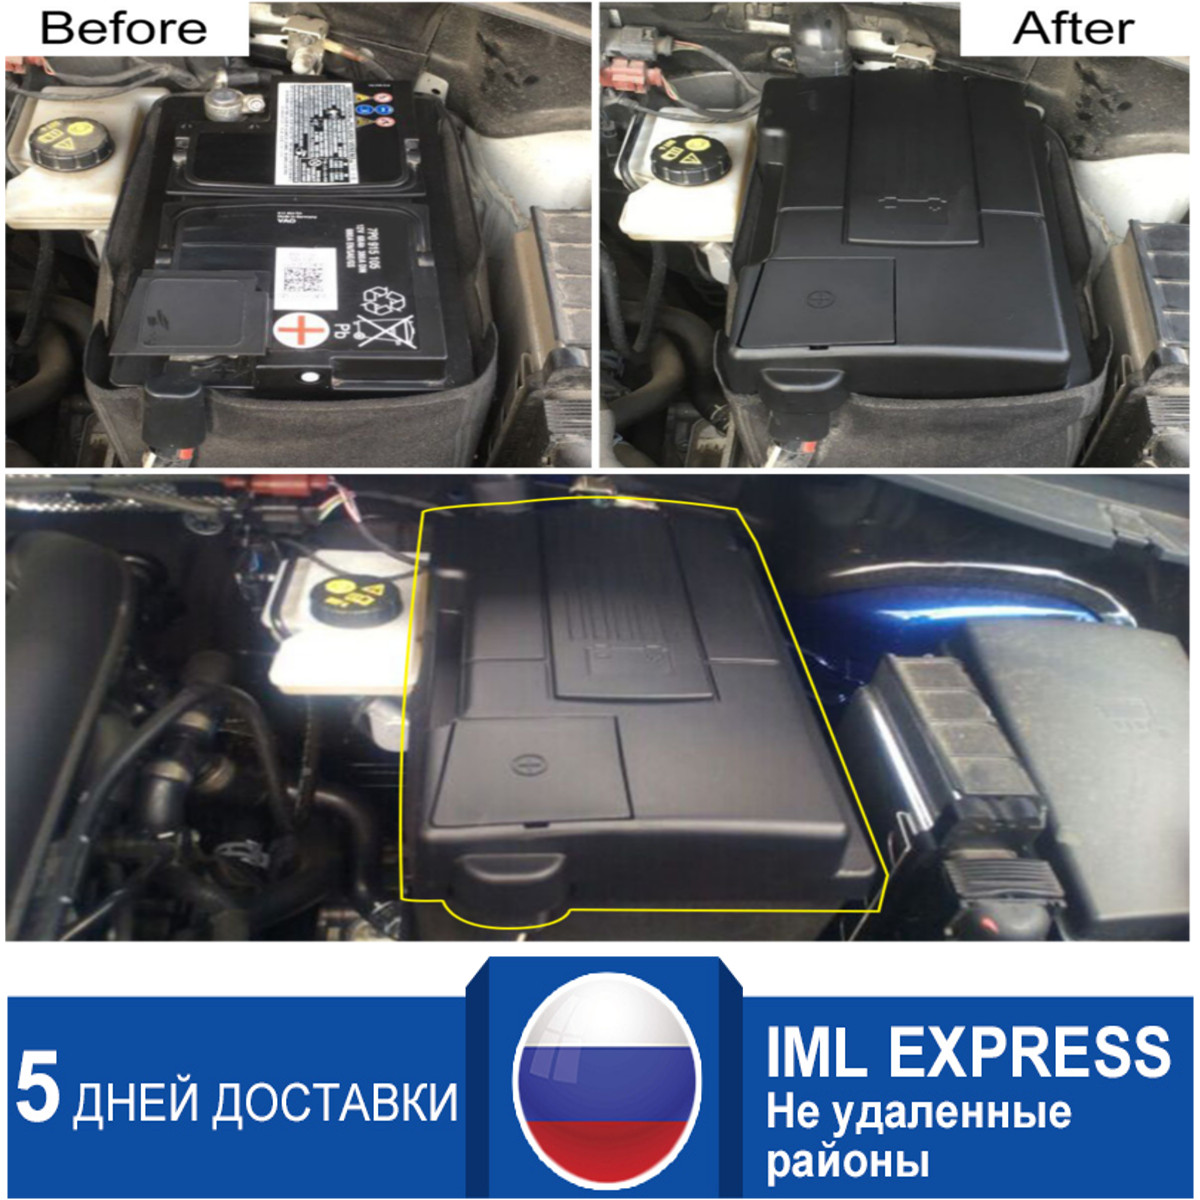 Engine Battery Dustproof Negative Electrode Waterproof Protective Cover For Skoda Kodiaq Octavia 5E A7 VW Tiguan L 2016 - 2019